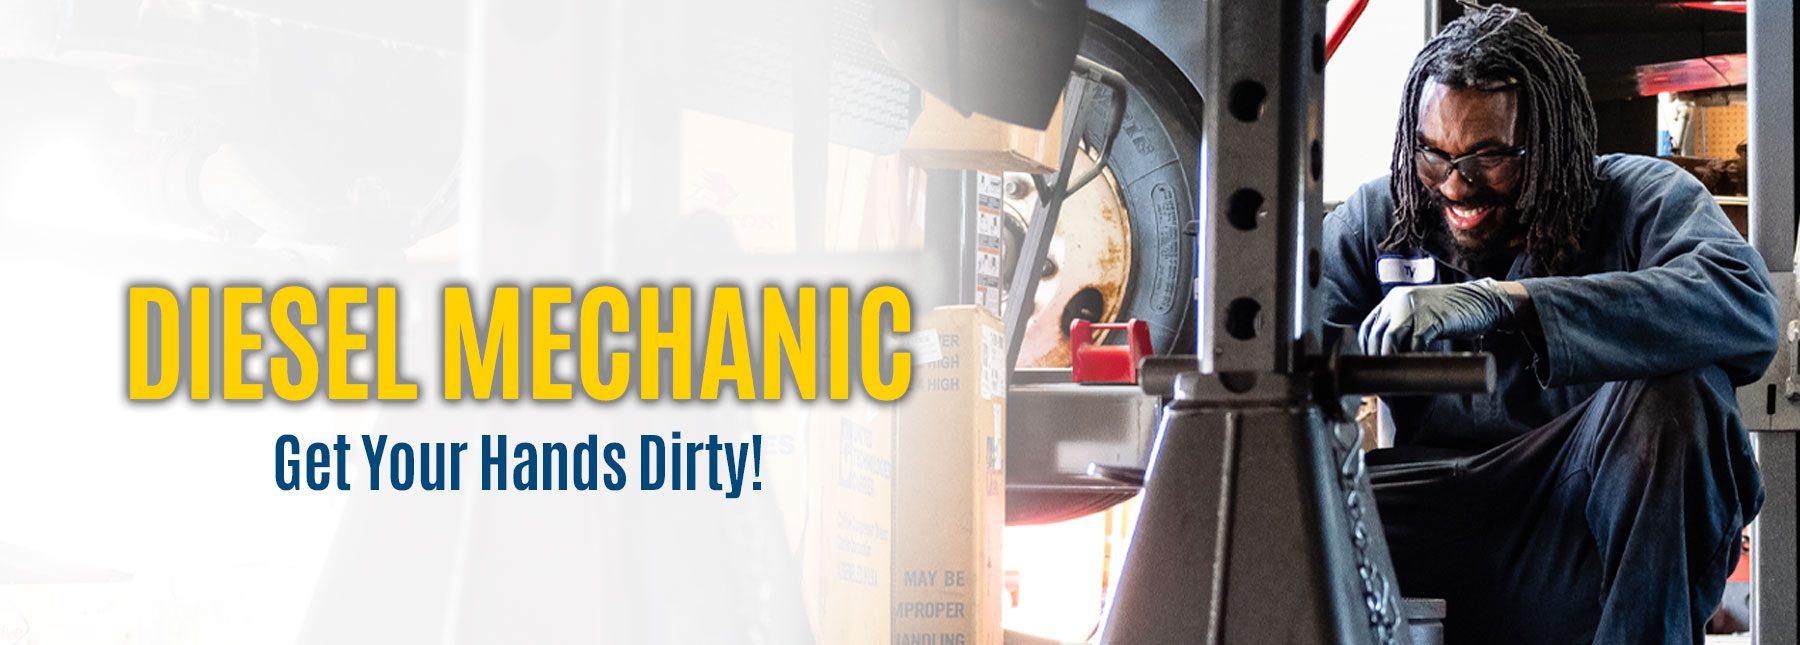 Diesel Mechanic 20210727 1800x645